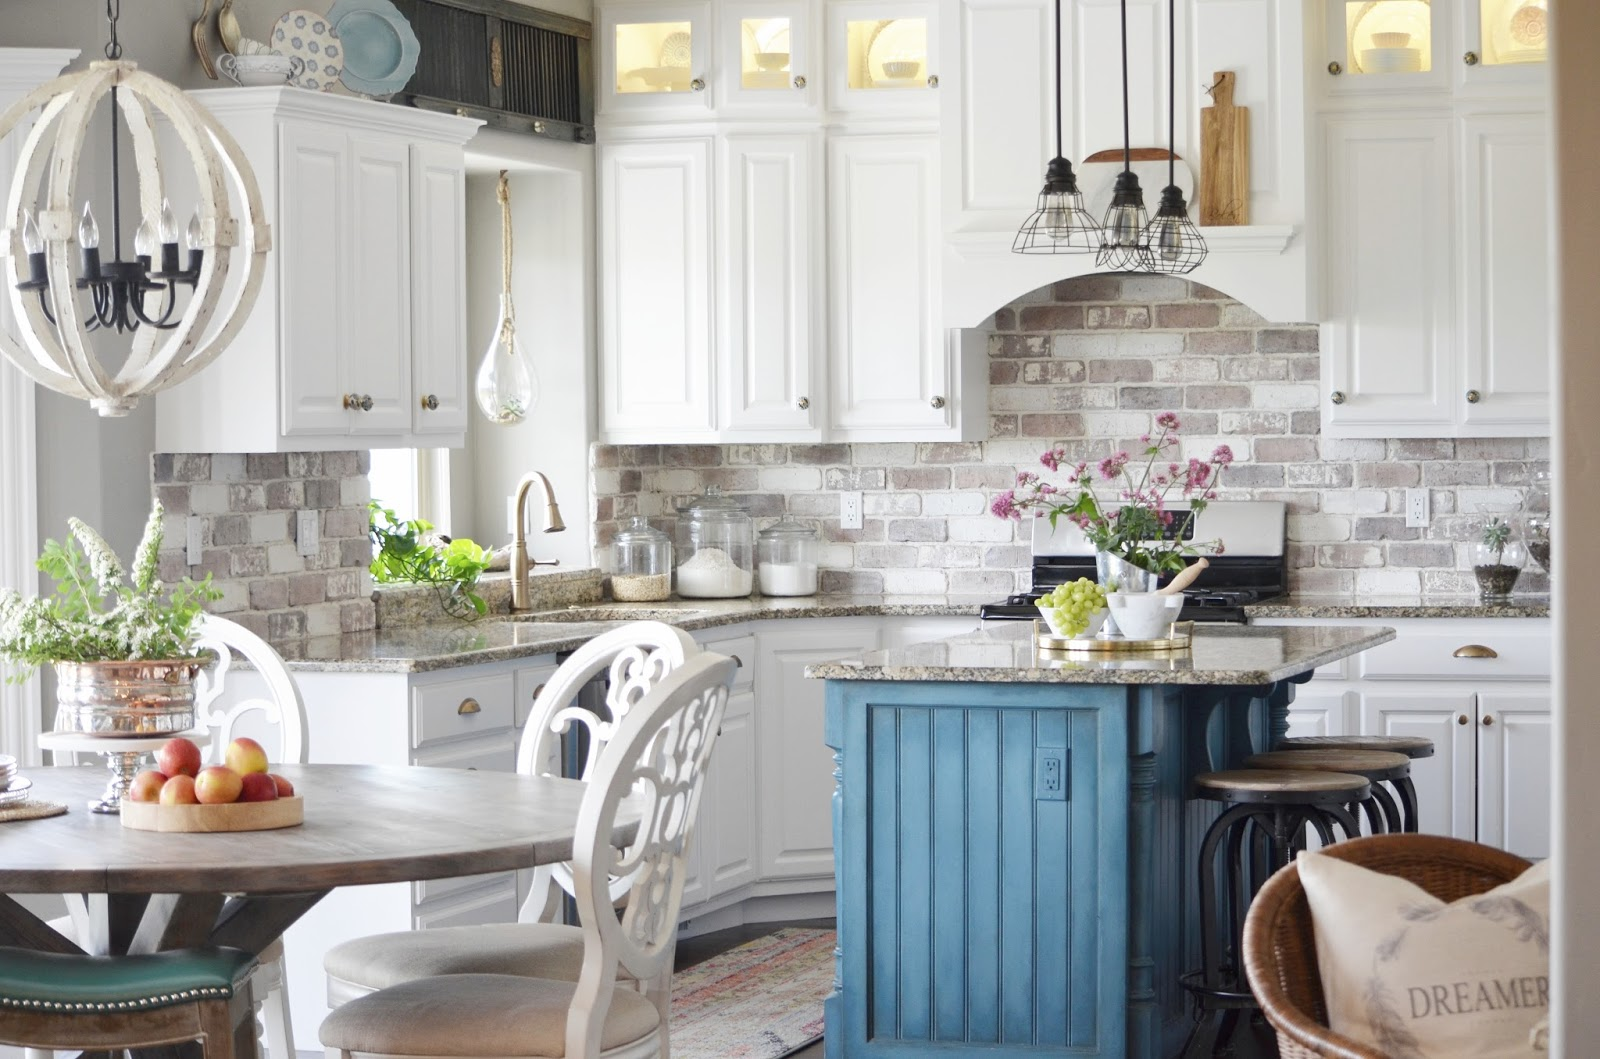 rustic, country kitchen, chalk paint, brick backsplash, white kitchen, kitchen renovation, painted cabinets, painted kitchen, diy kitchen, diy backsplash